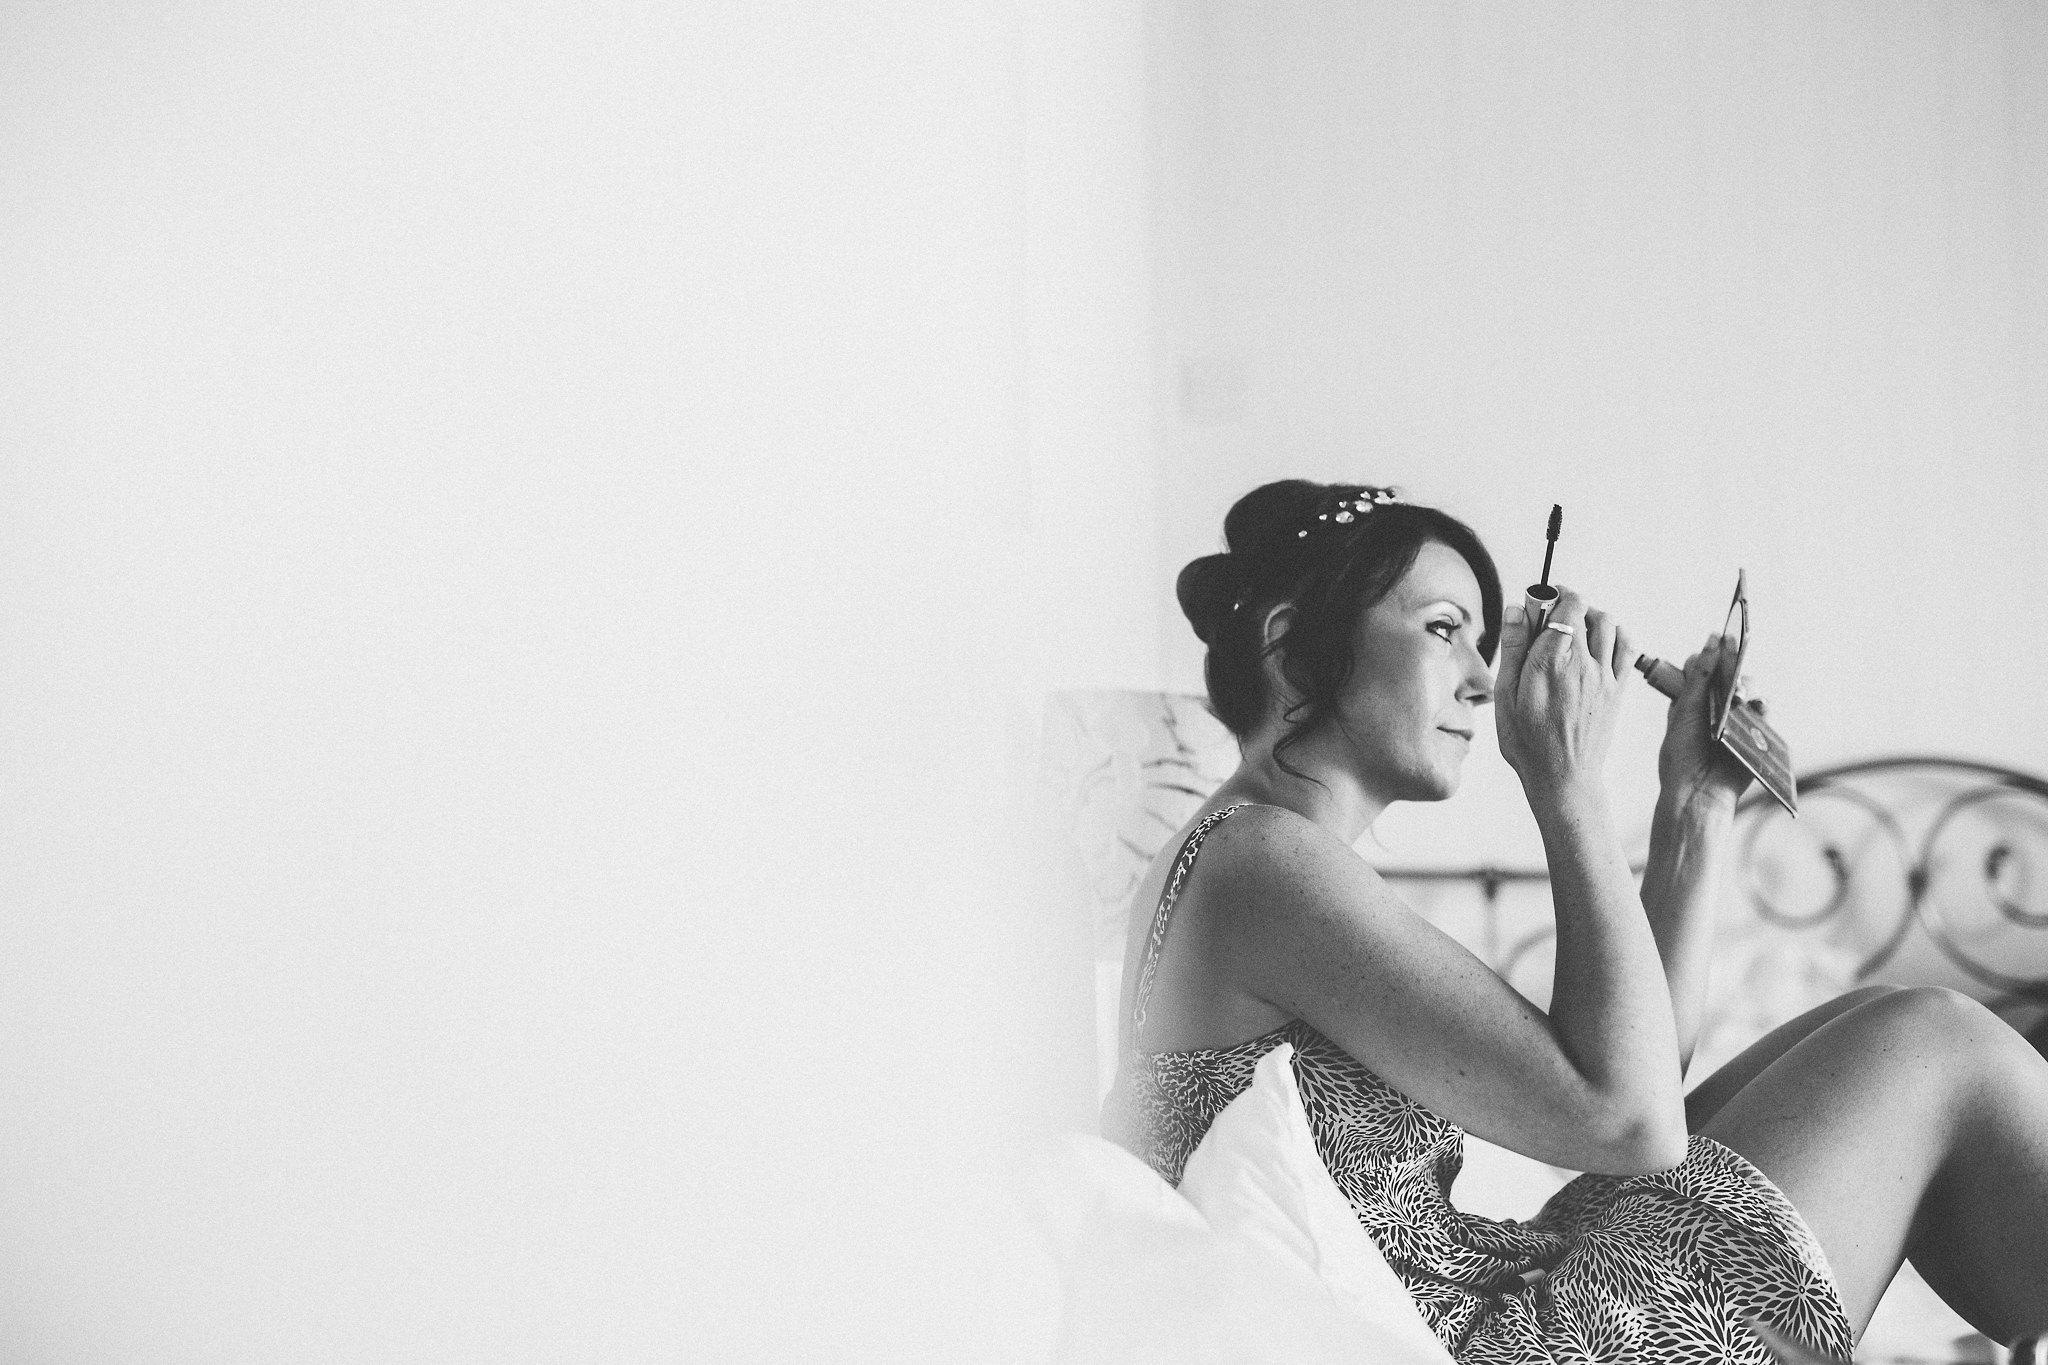 paul-marbrook-Caer-Llan-Wedding-Photographer-90020